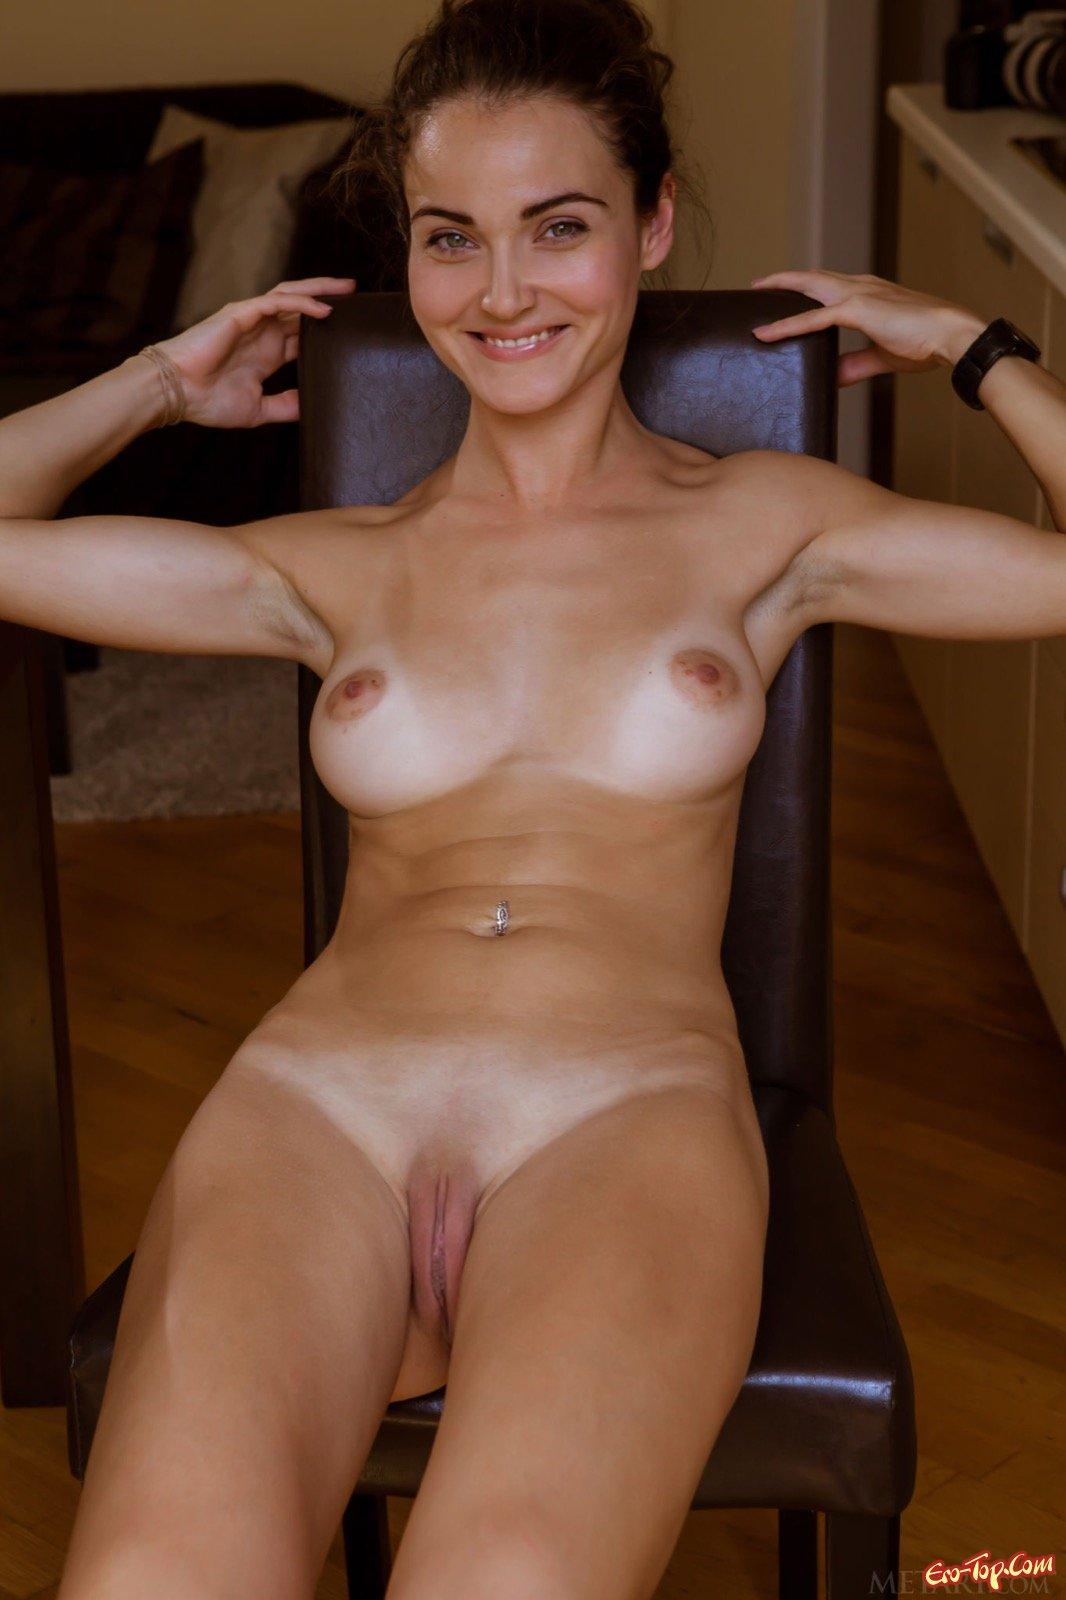 Милая леди сняла трусы у себя в домашних условиях до гола секс фото